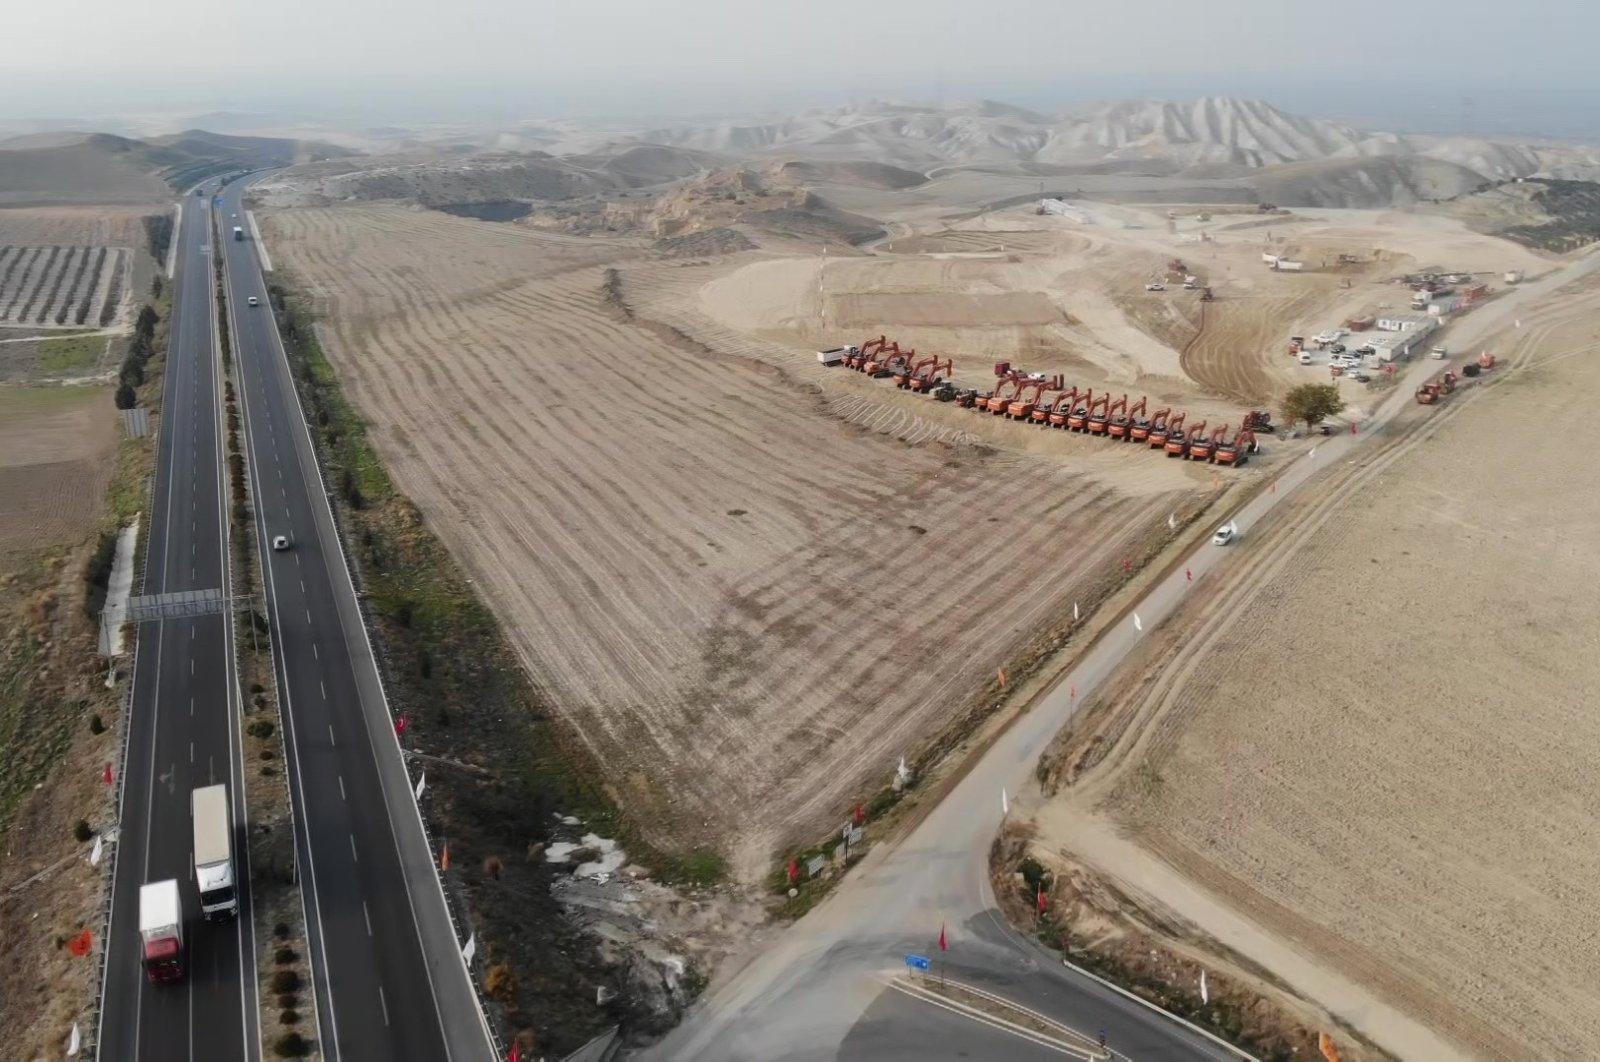 An aerial view shows the construction of the Aydın-Denizli highway in western Turkey, Nov. 16, 2020. (IHA Photo)